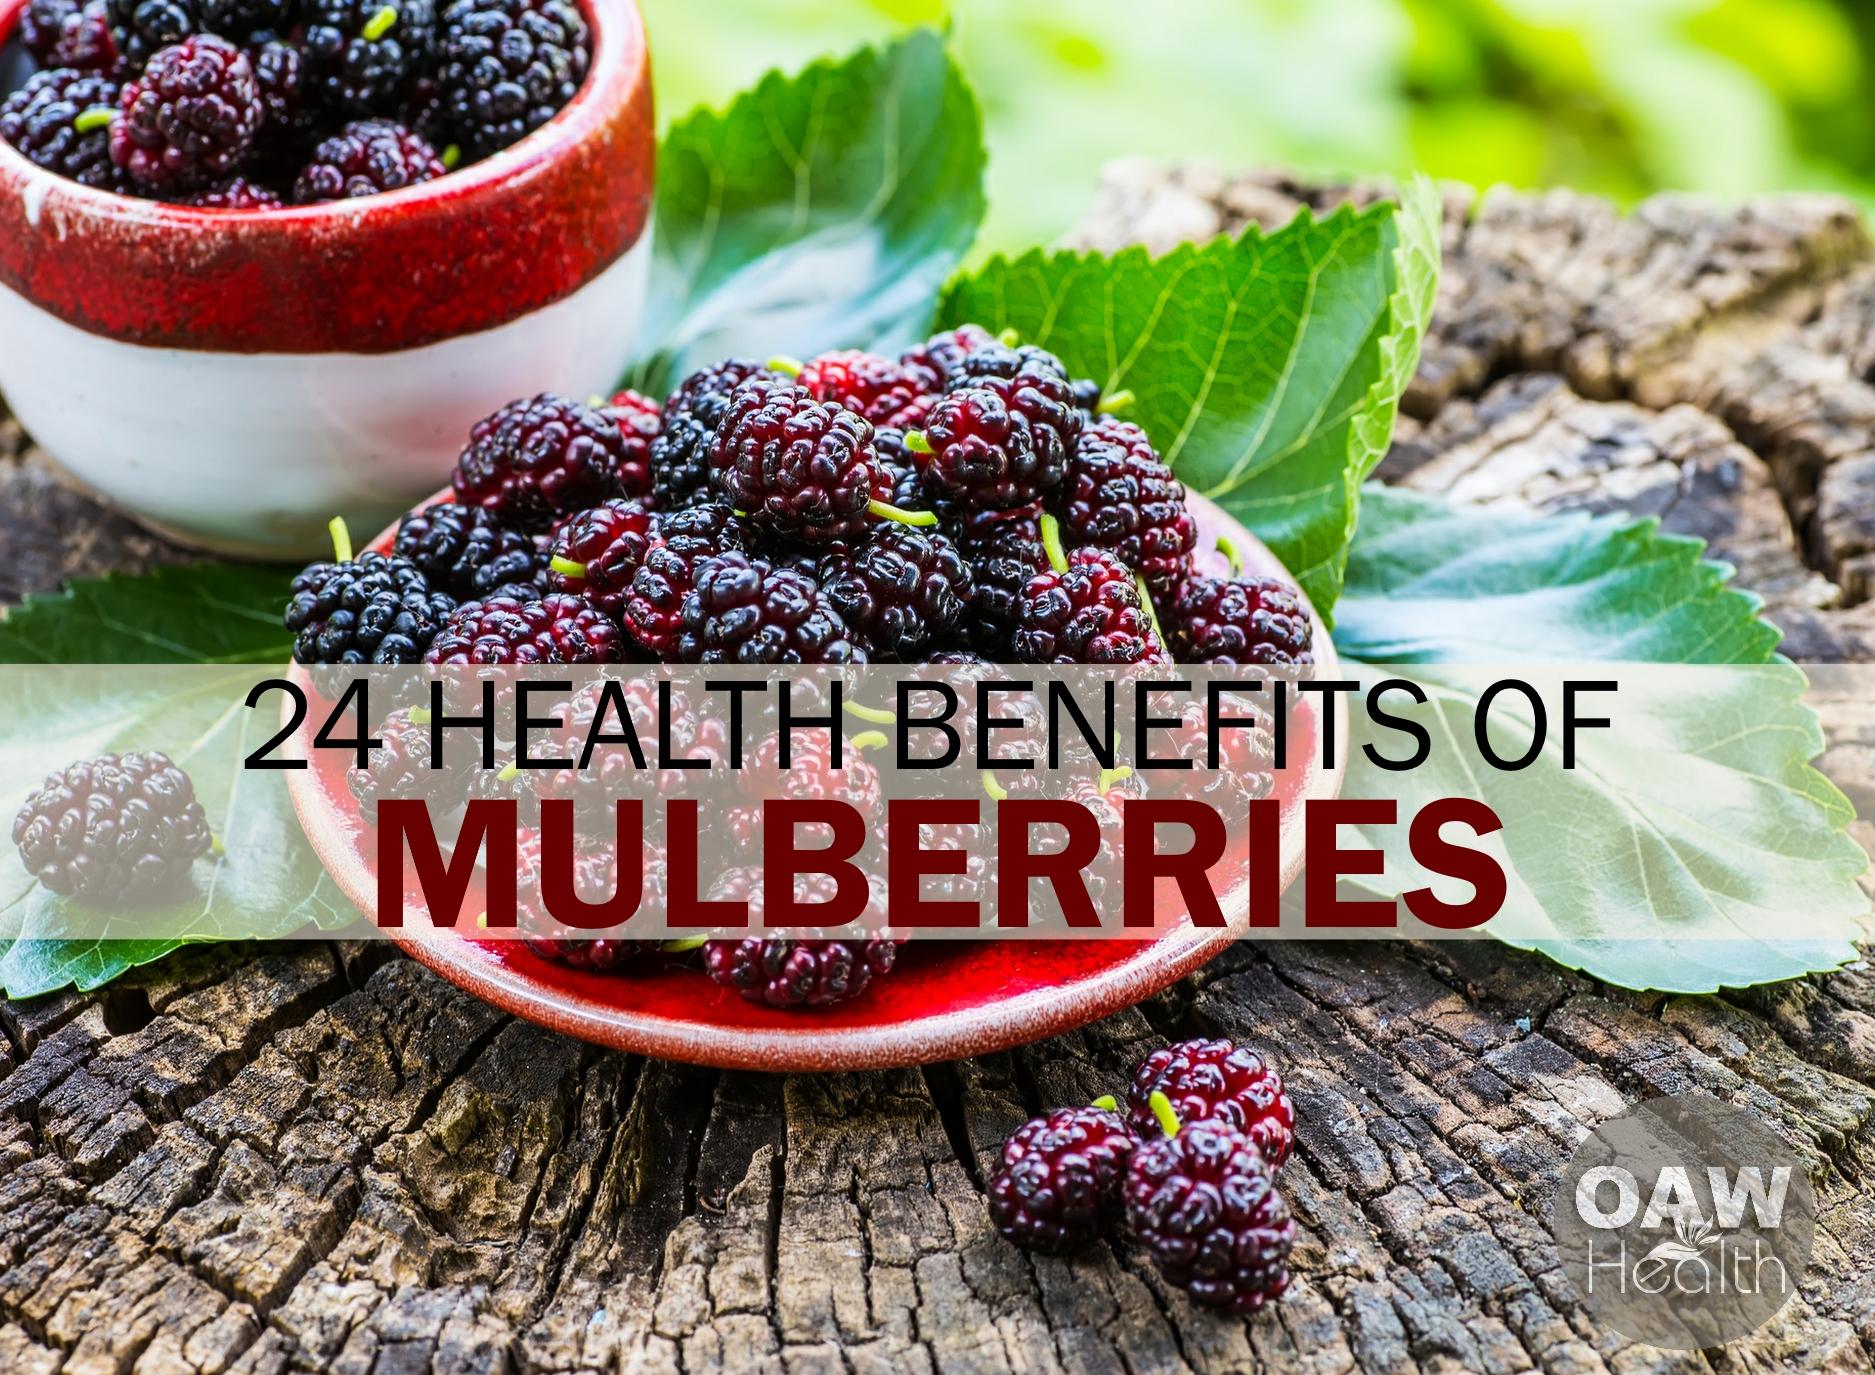 24 Outstanding Health Benefits of Mulberries